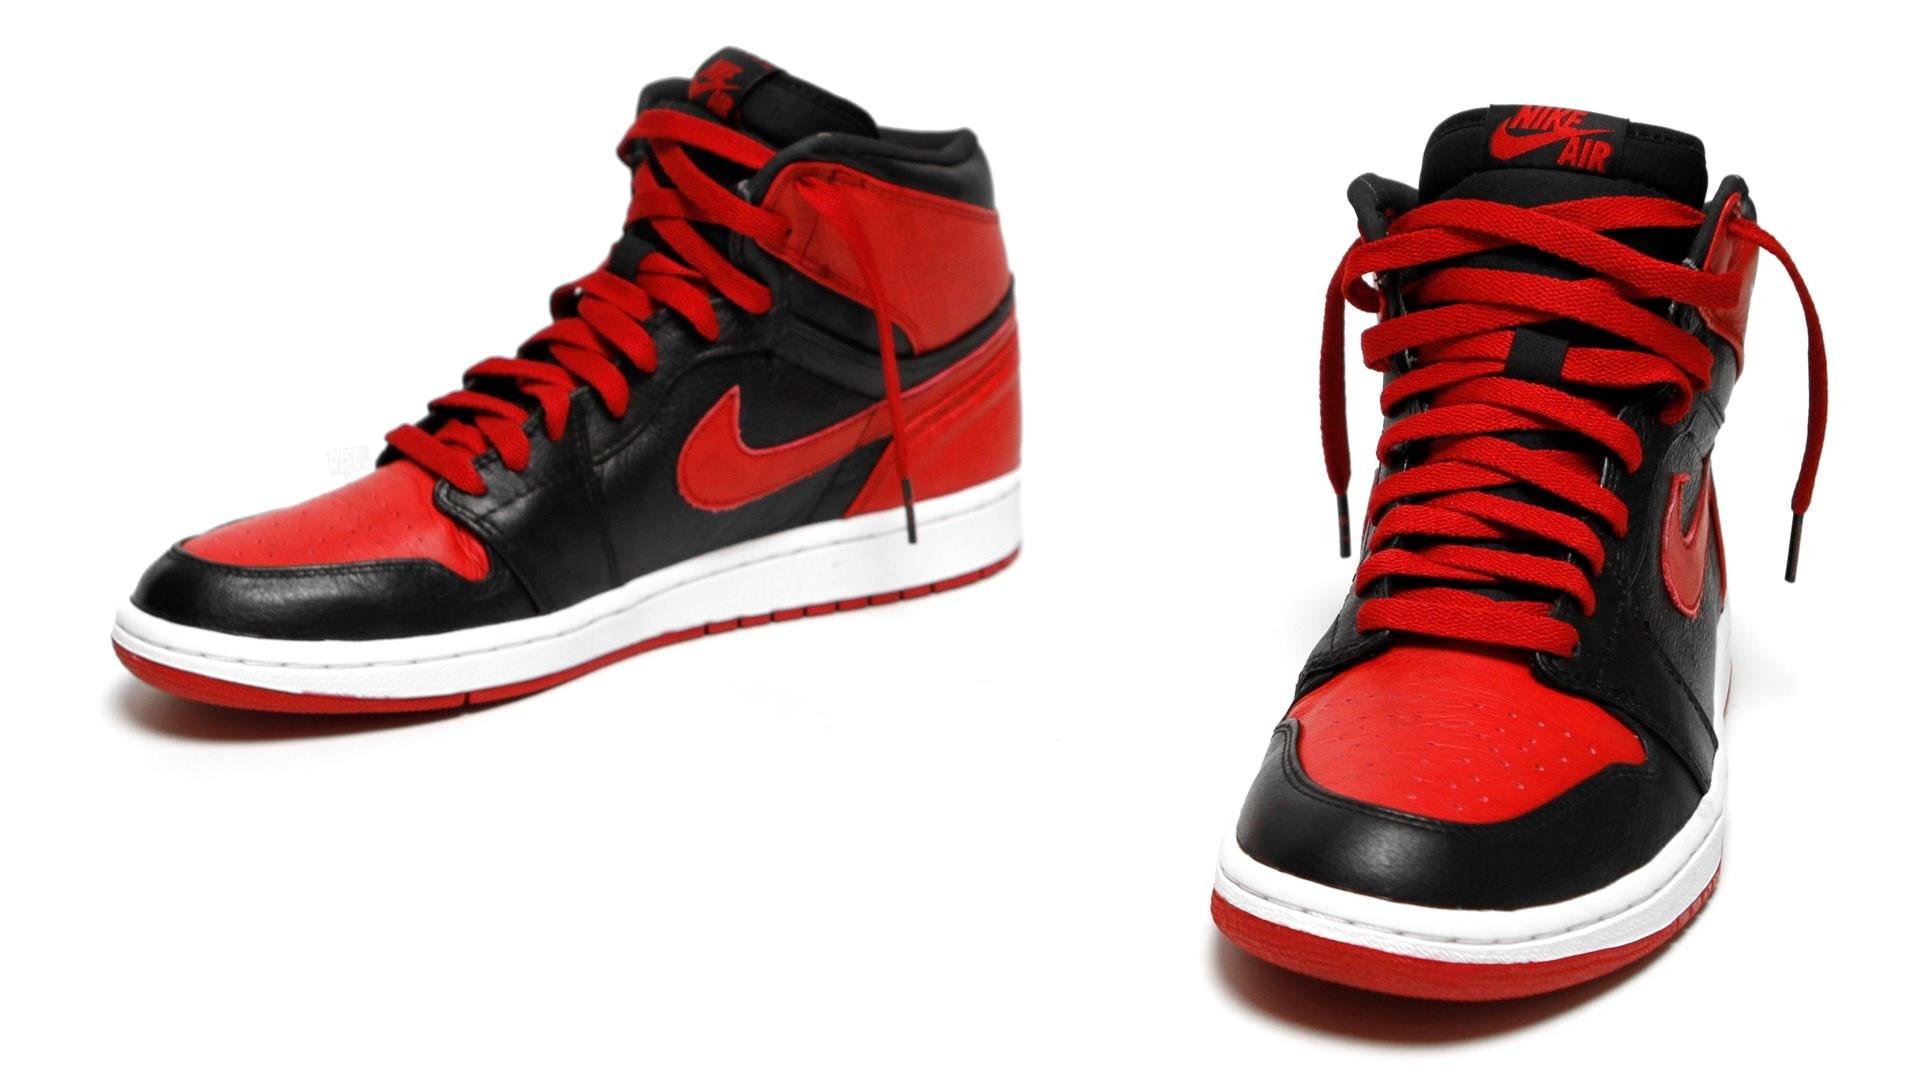 Res: 1920x1080, Retro Jordans Wallpapers 31725 HD Wallpapers